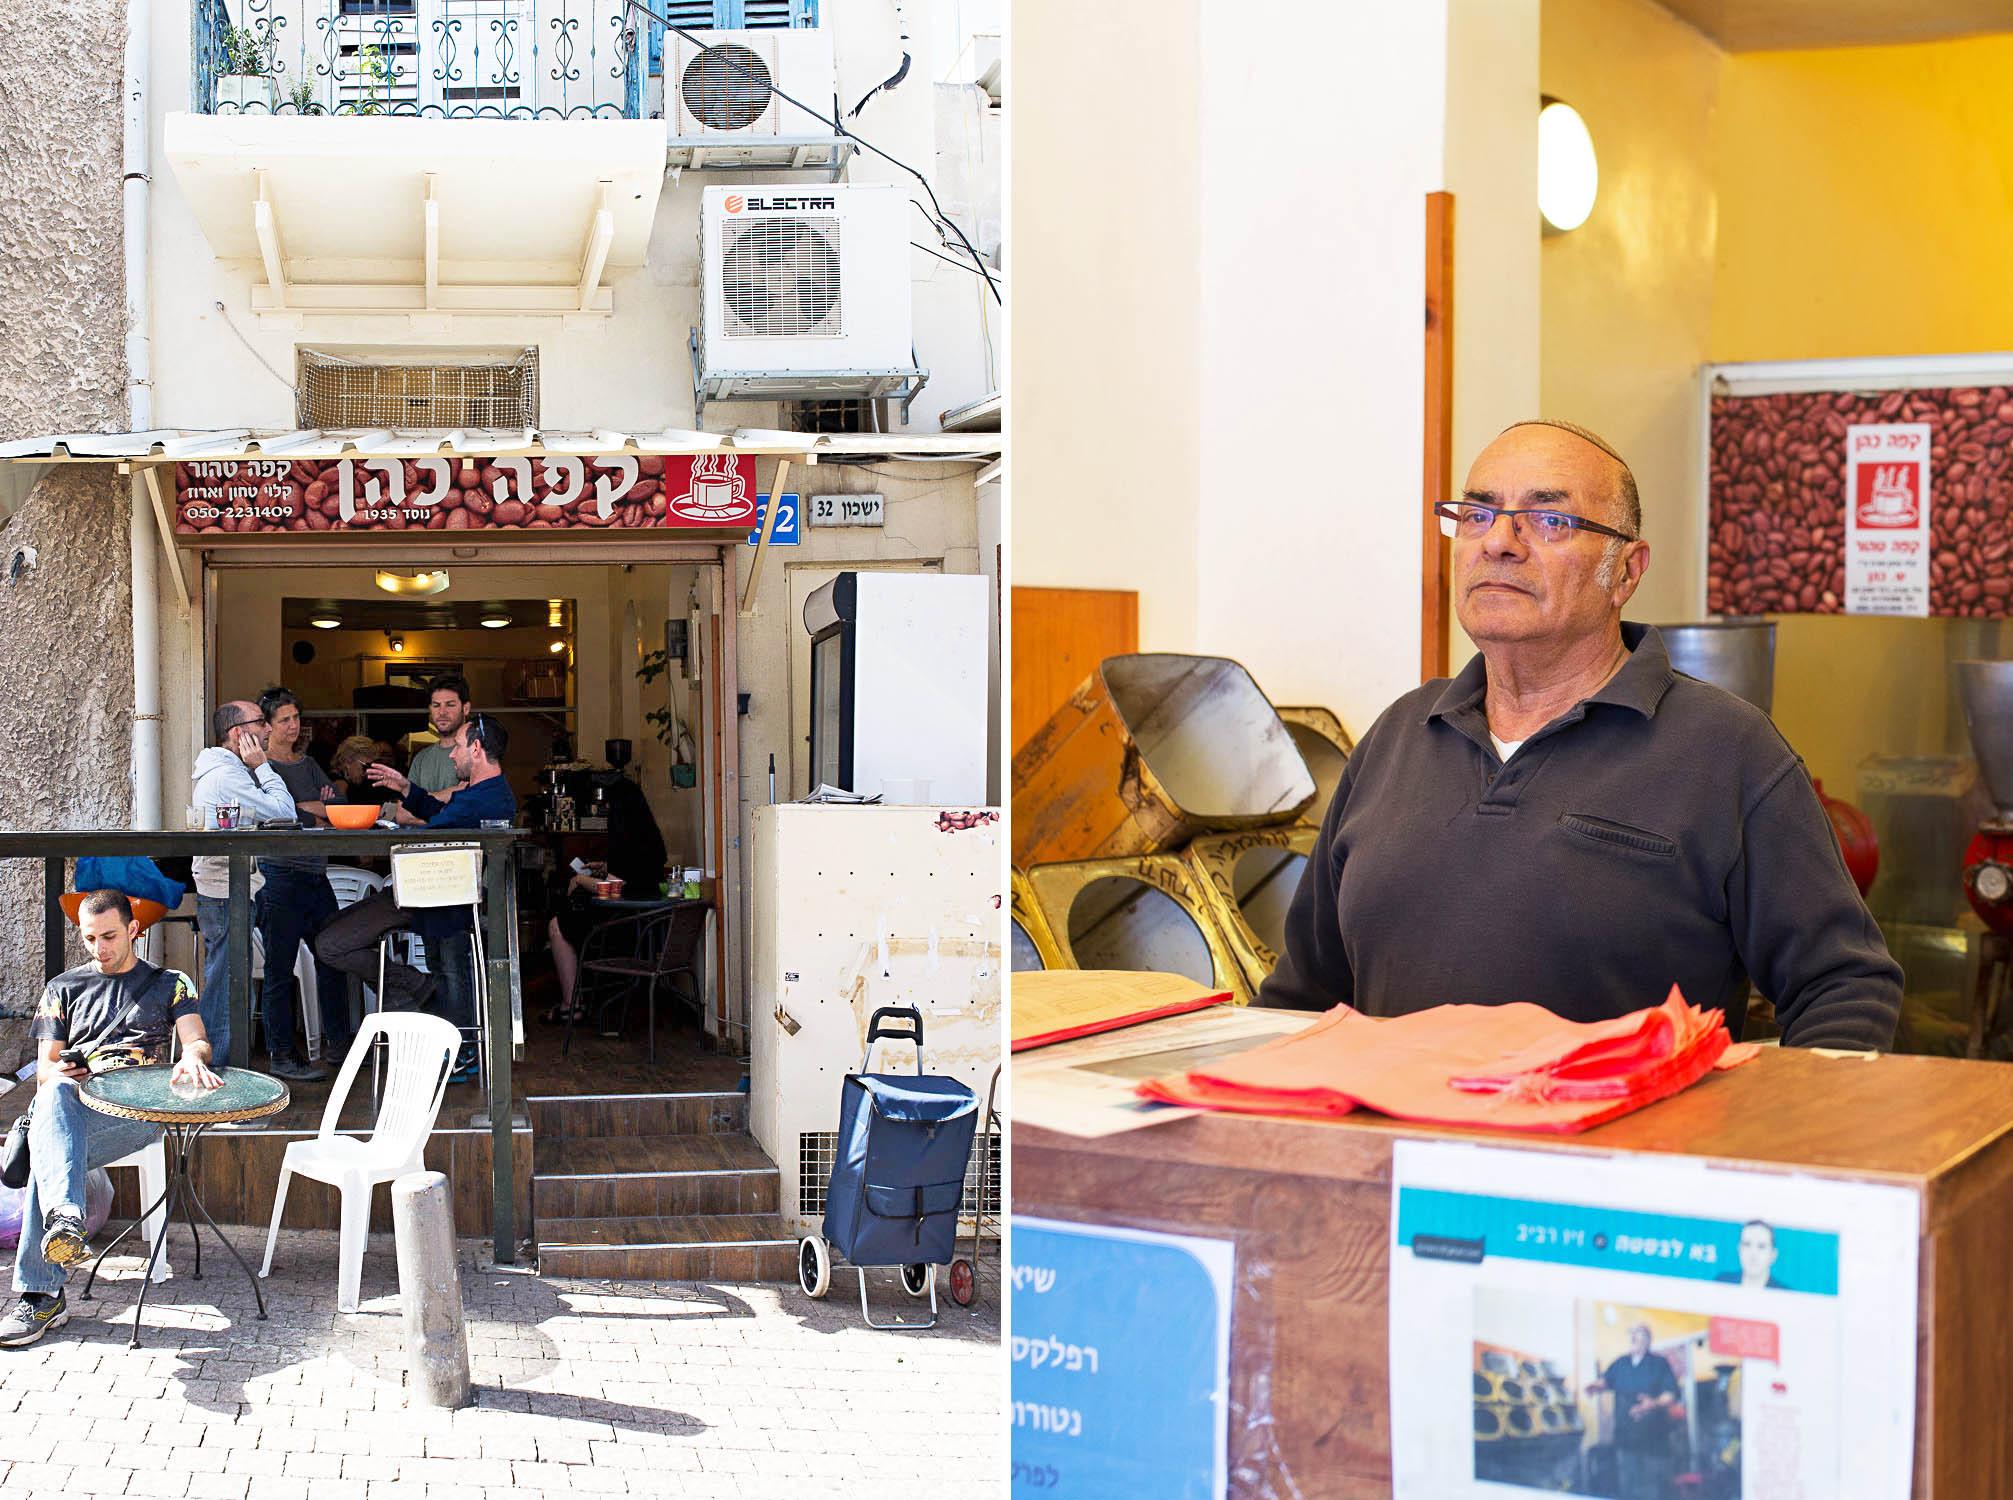 Cafe Cohen - Carmel Market, Shuk HaCarmel. Tel Aviv, Israel